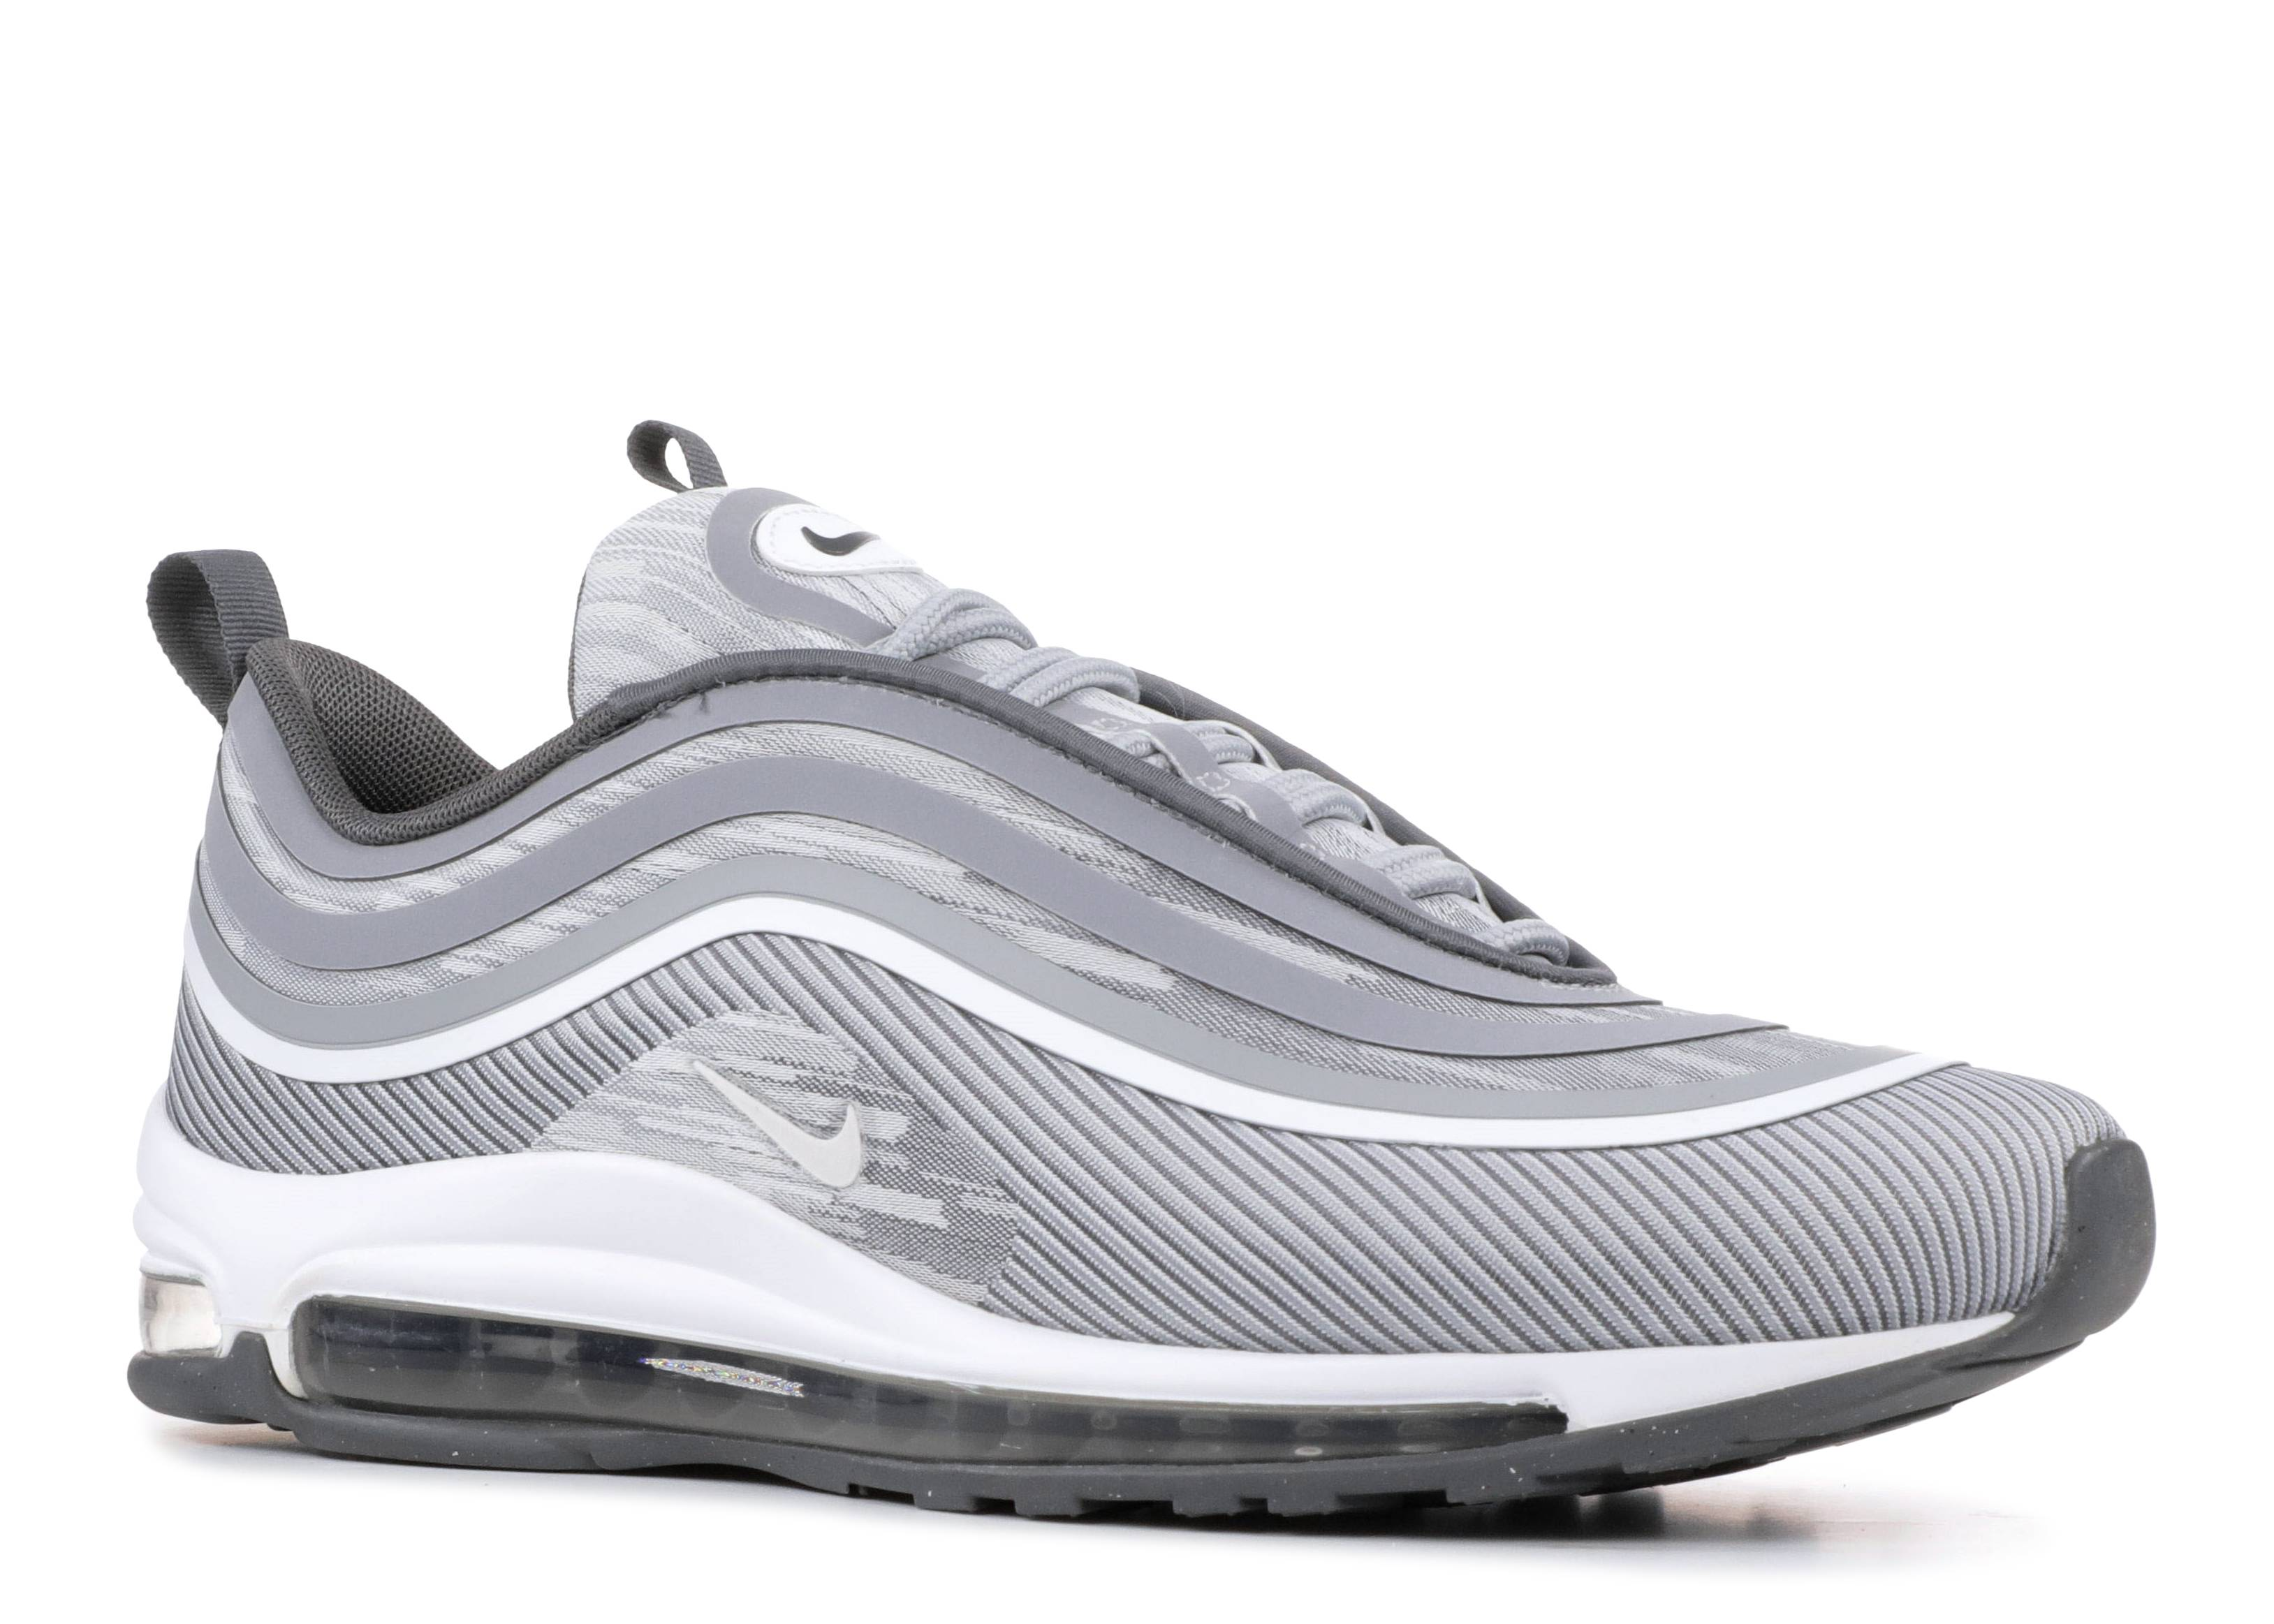 NIKE AIR MAX 97 Ultra 17 Grey Silver Bullet Men Running Shoe Sneakers 918356 007